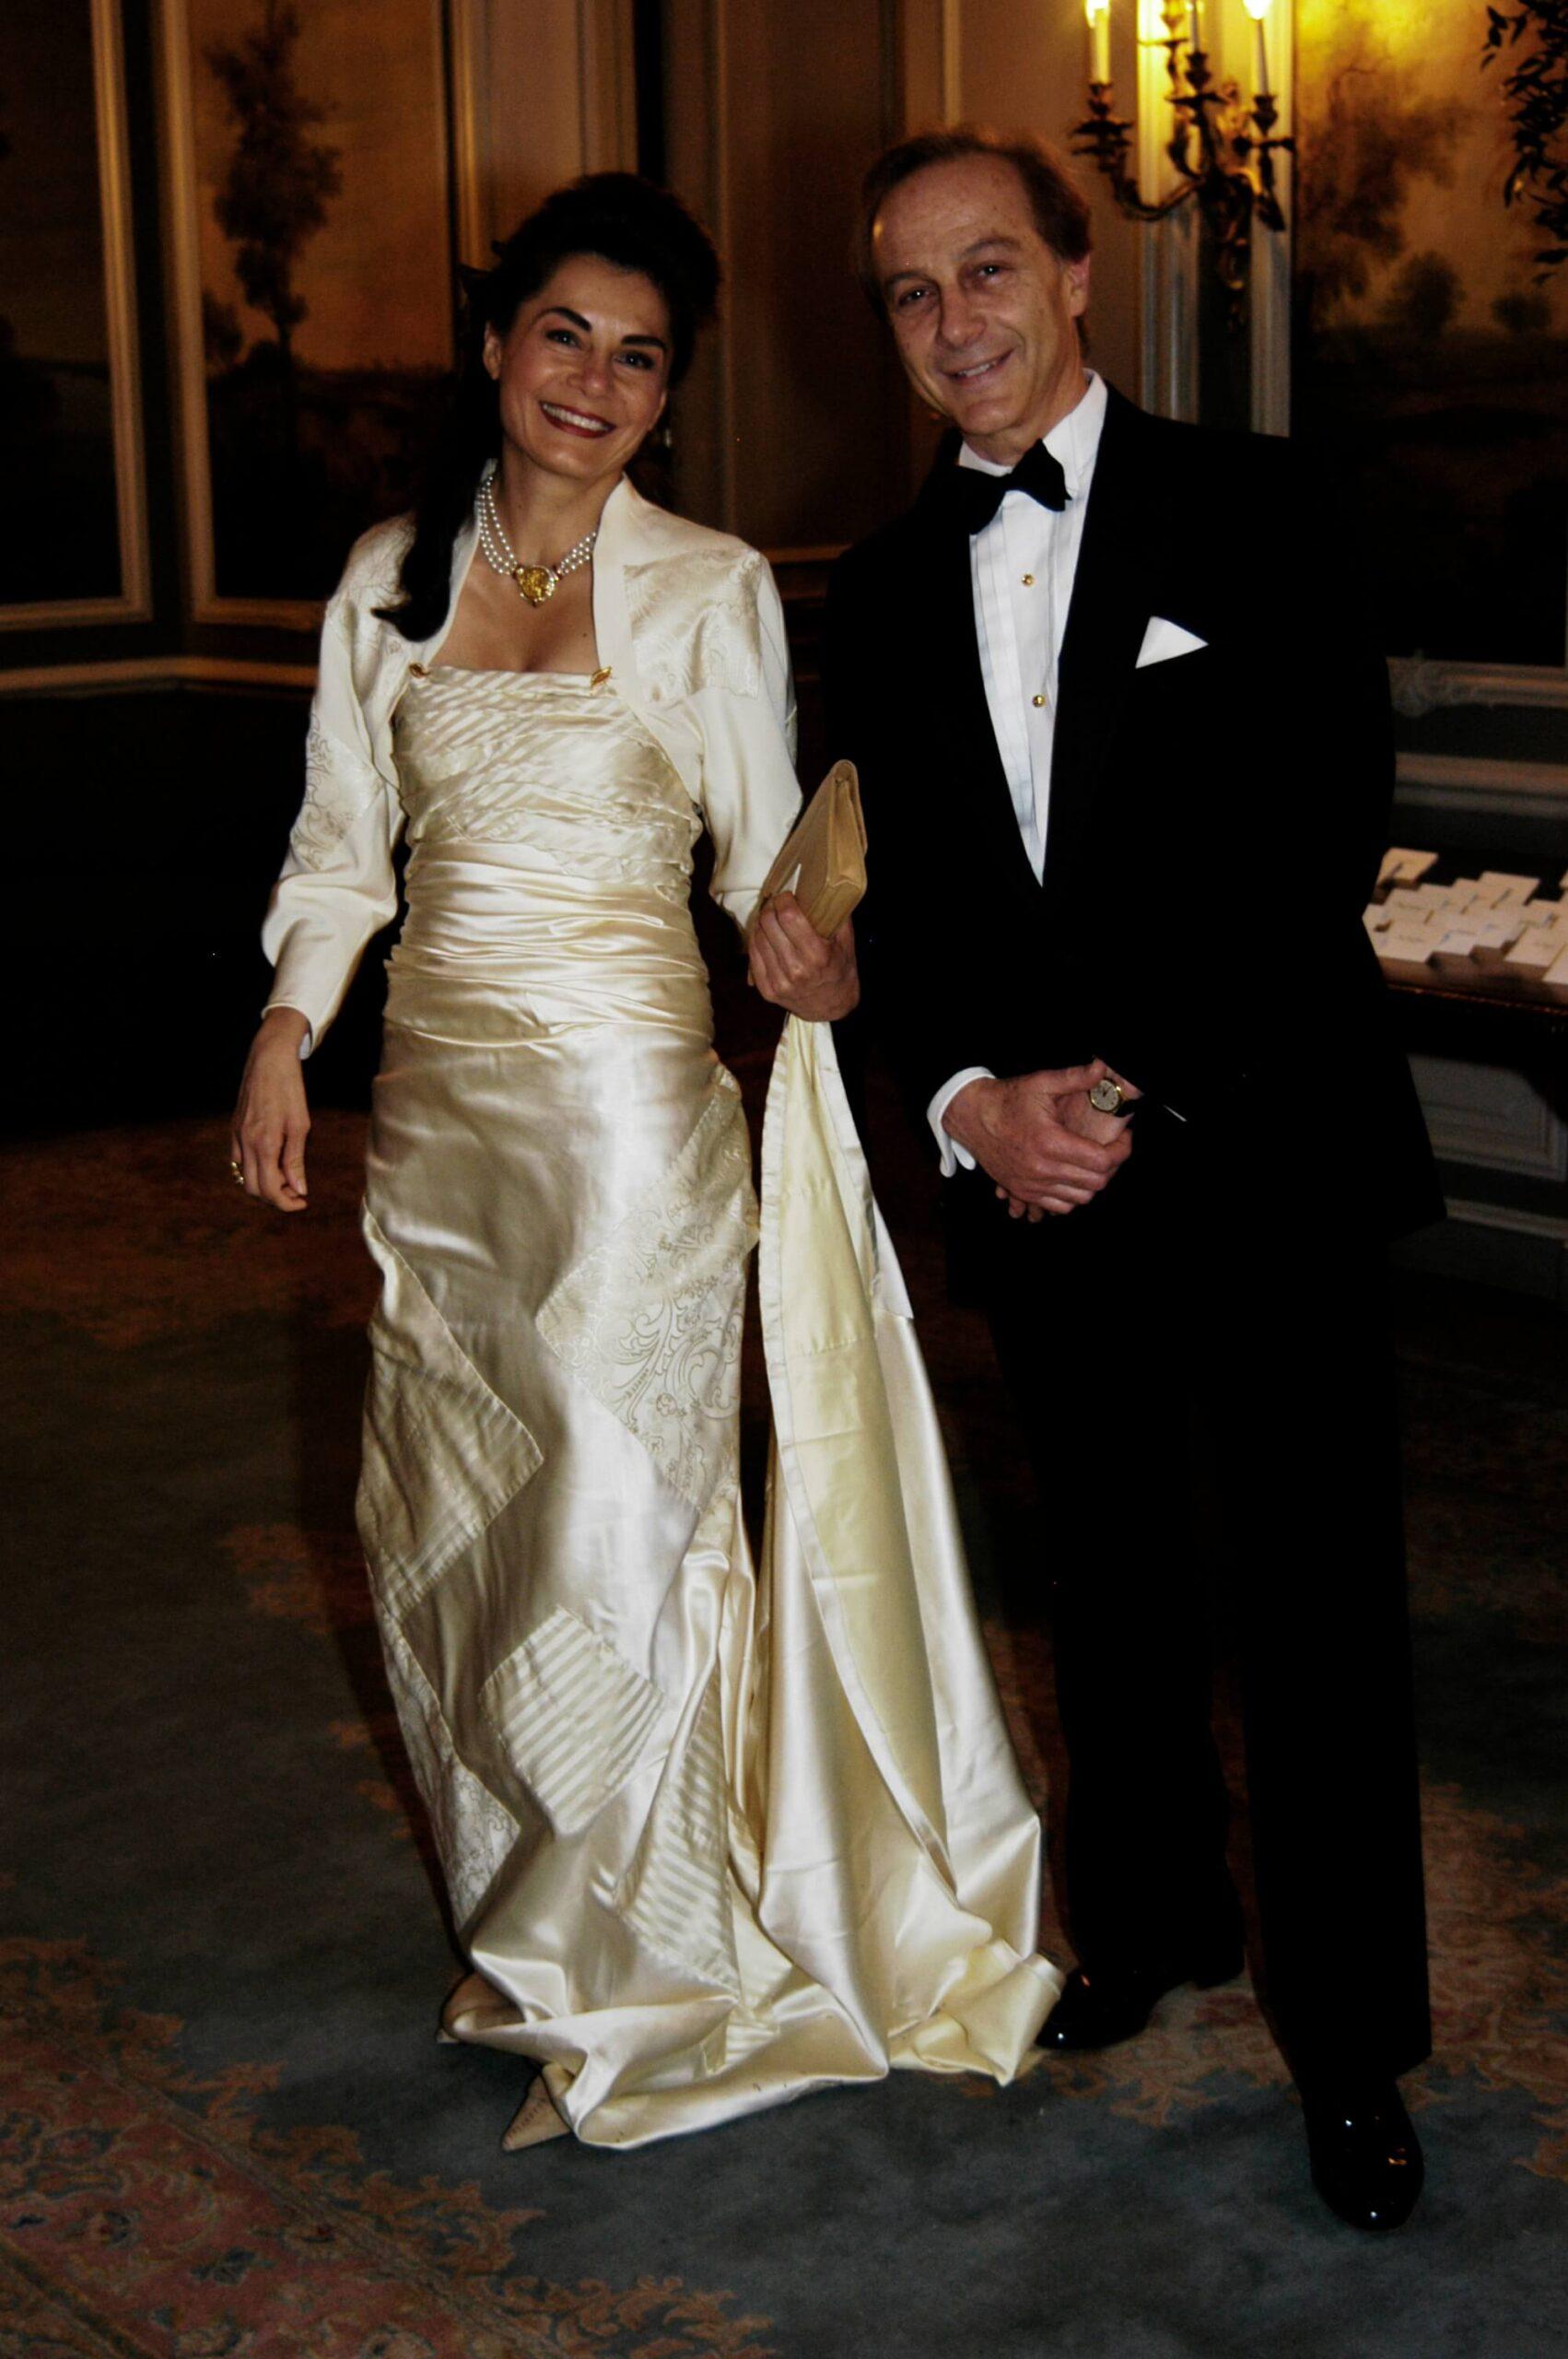 Mr. & Mrs. Maximo Flügelman